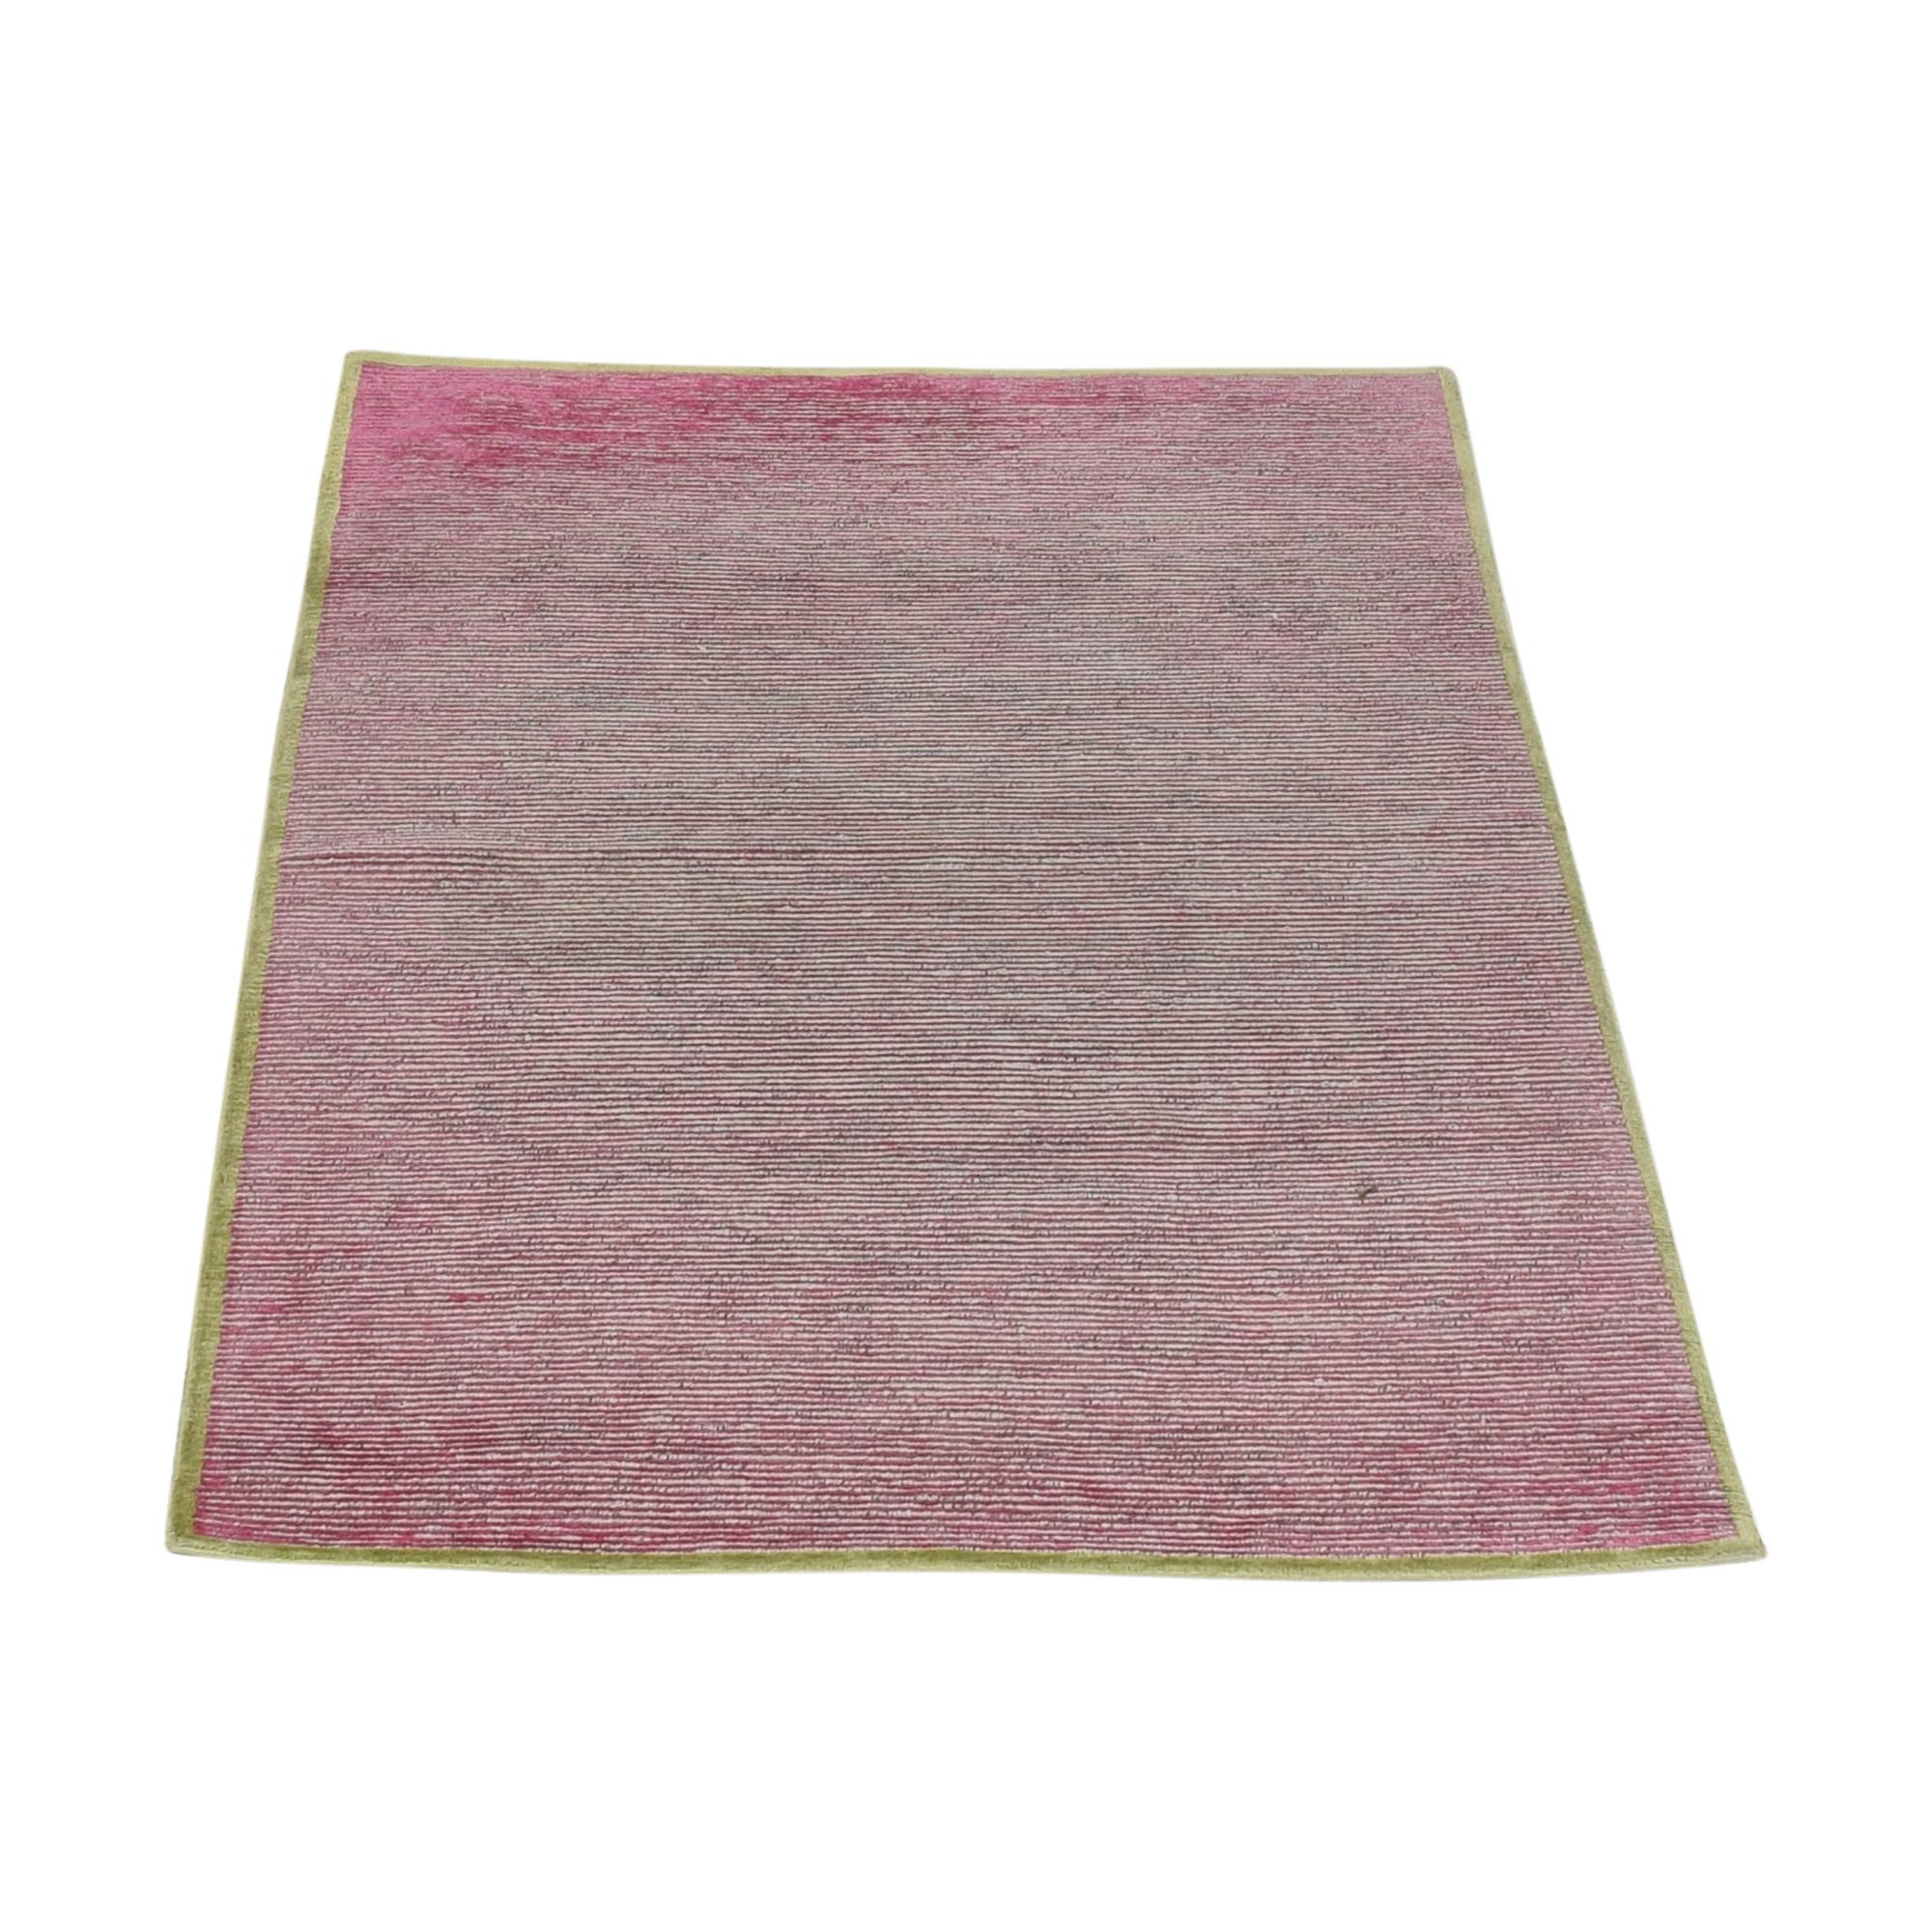 ABC Carpet & Home ABC Carpet & Home Custom Area Rug used